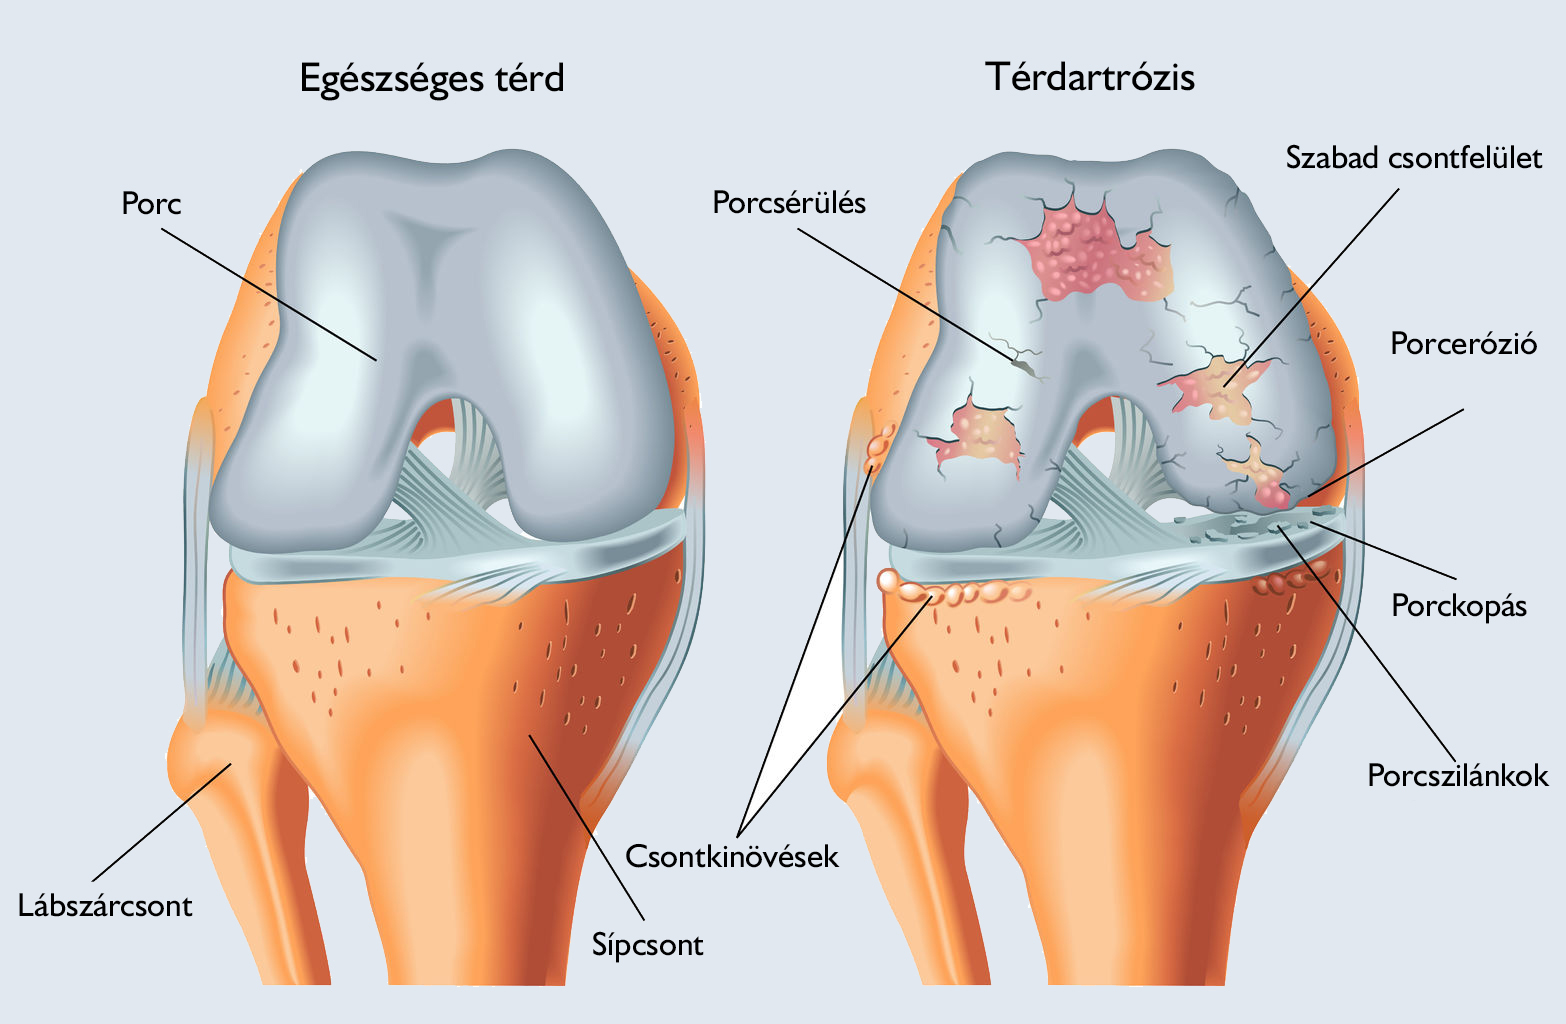 hipertireoidizmus ízületi fájdalom